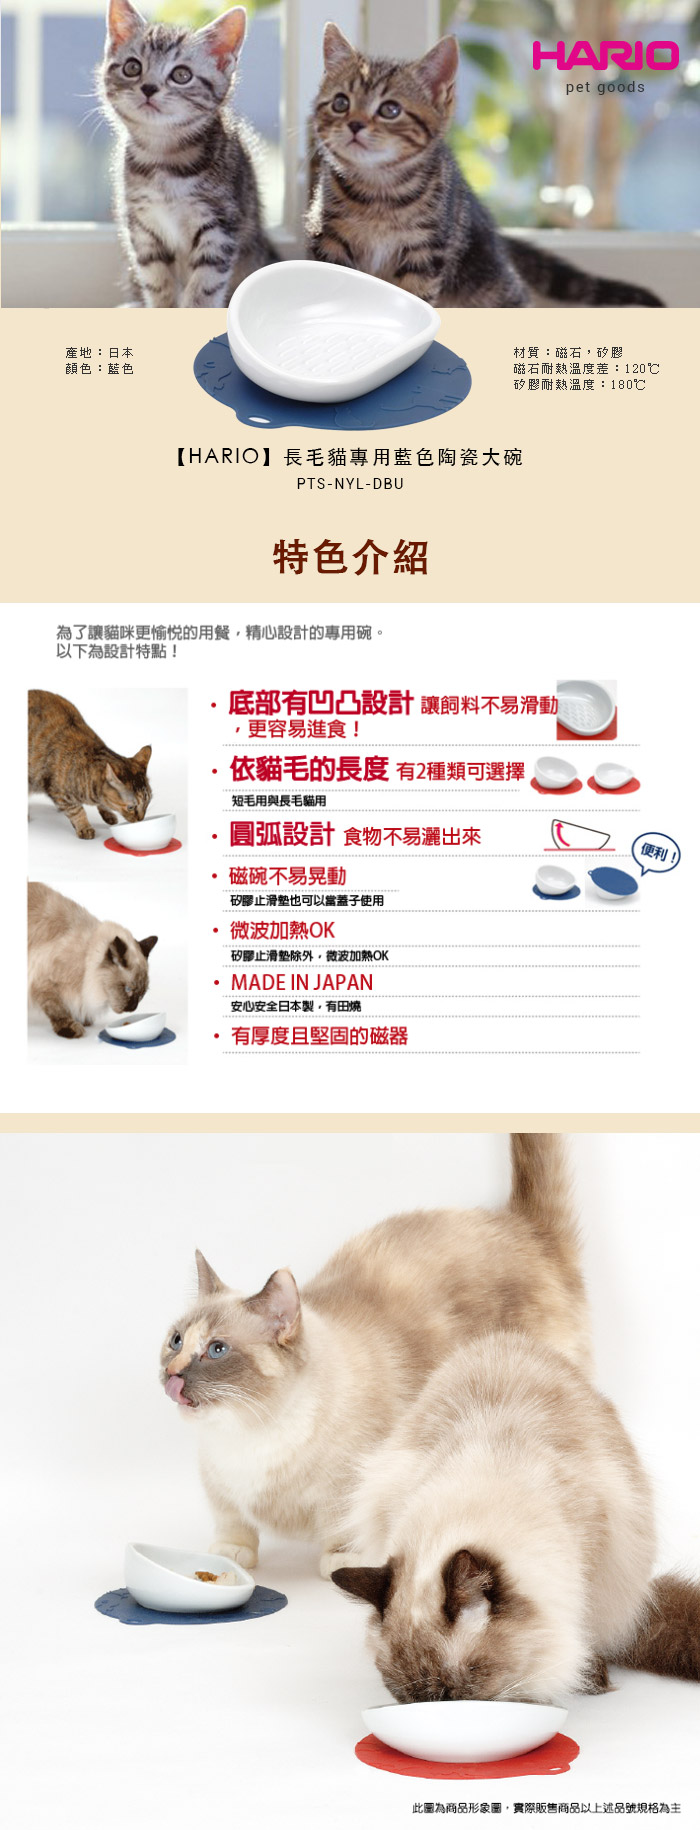 (複製)HARIO  長毛貓專用紅色陶瓷大碗  PTS-NYL-R